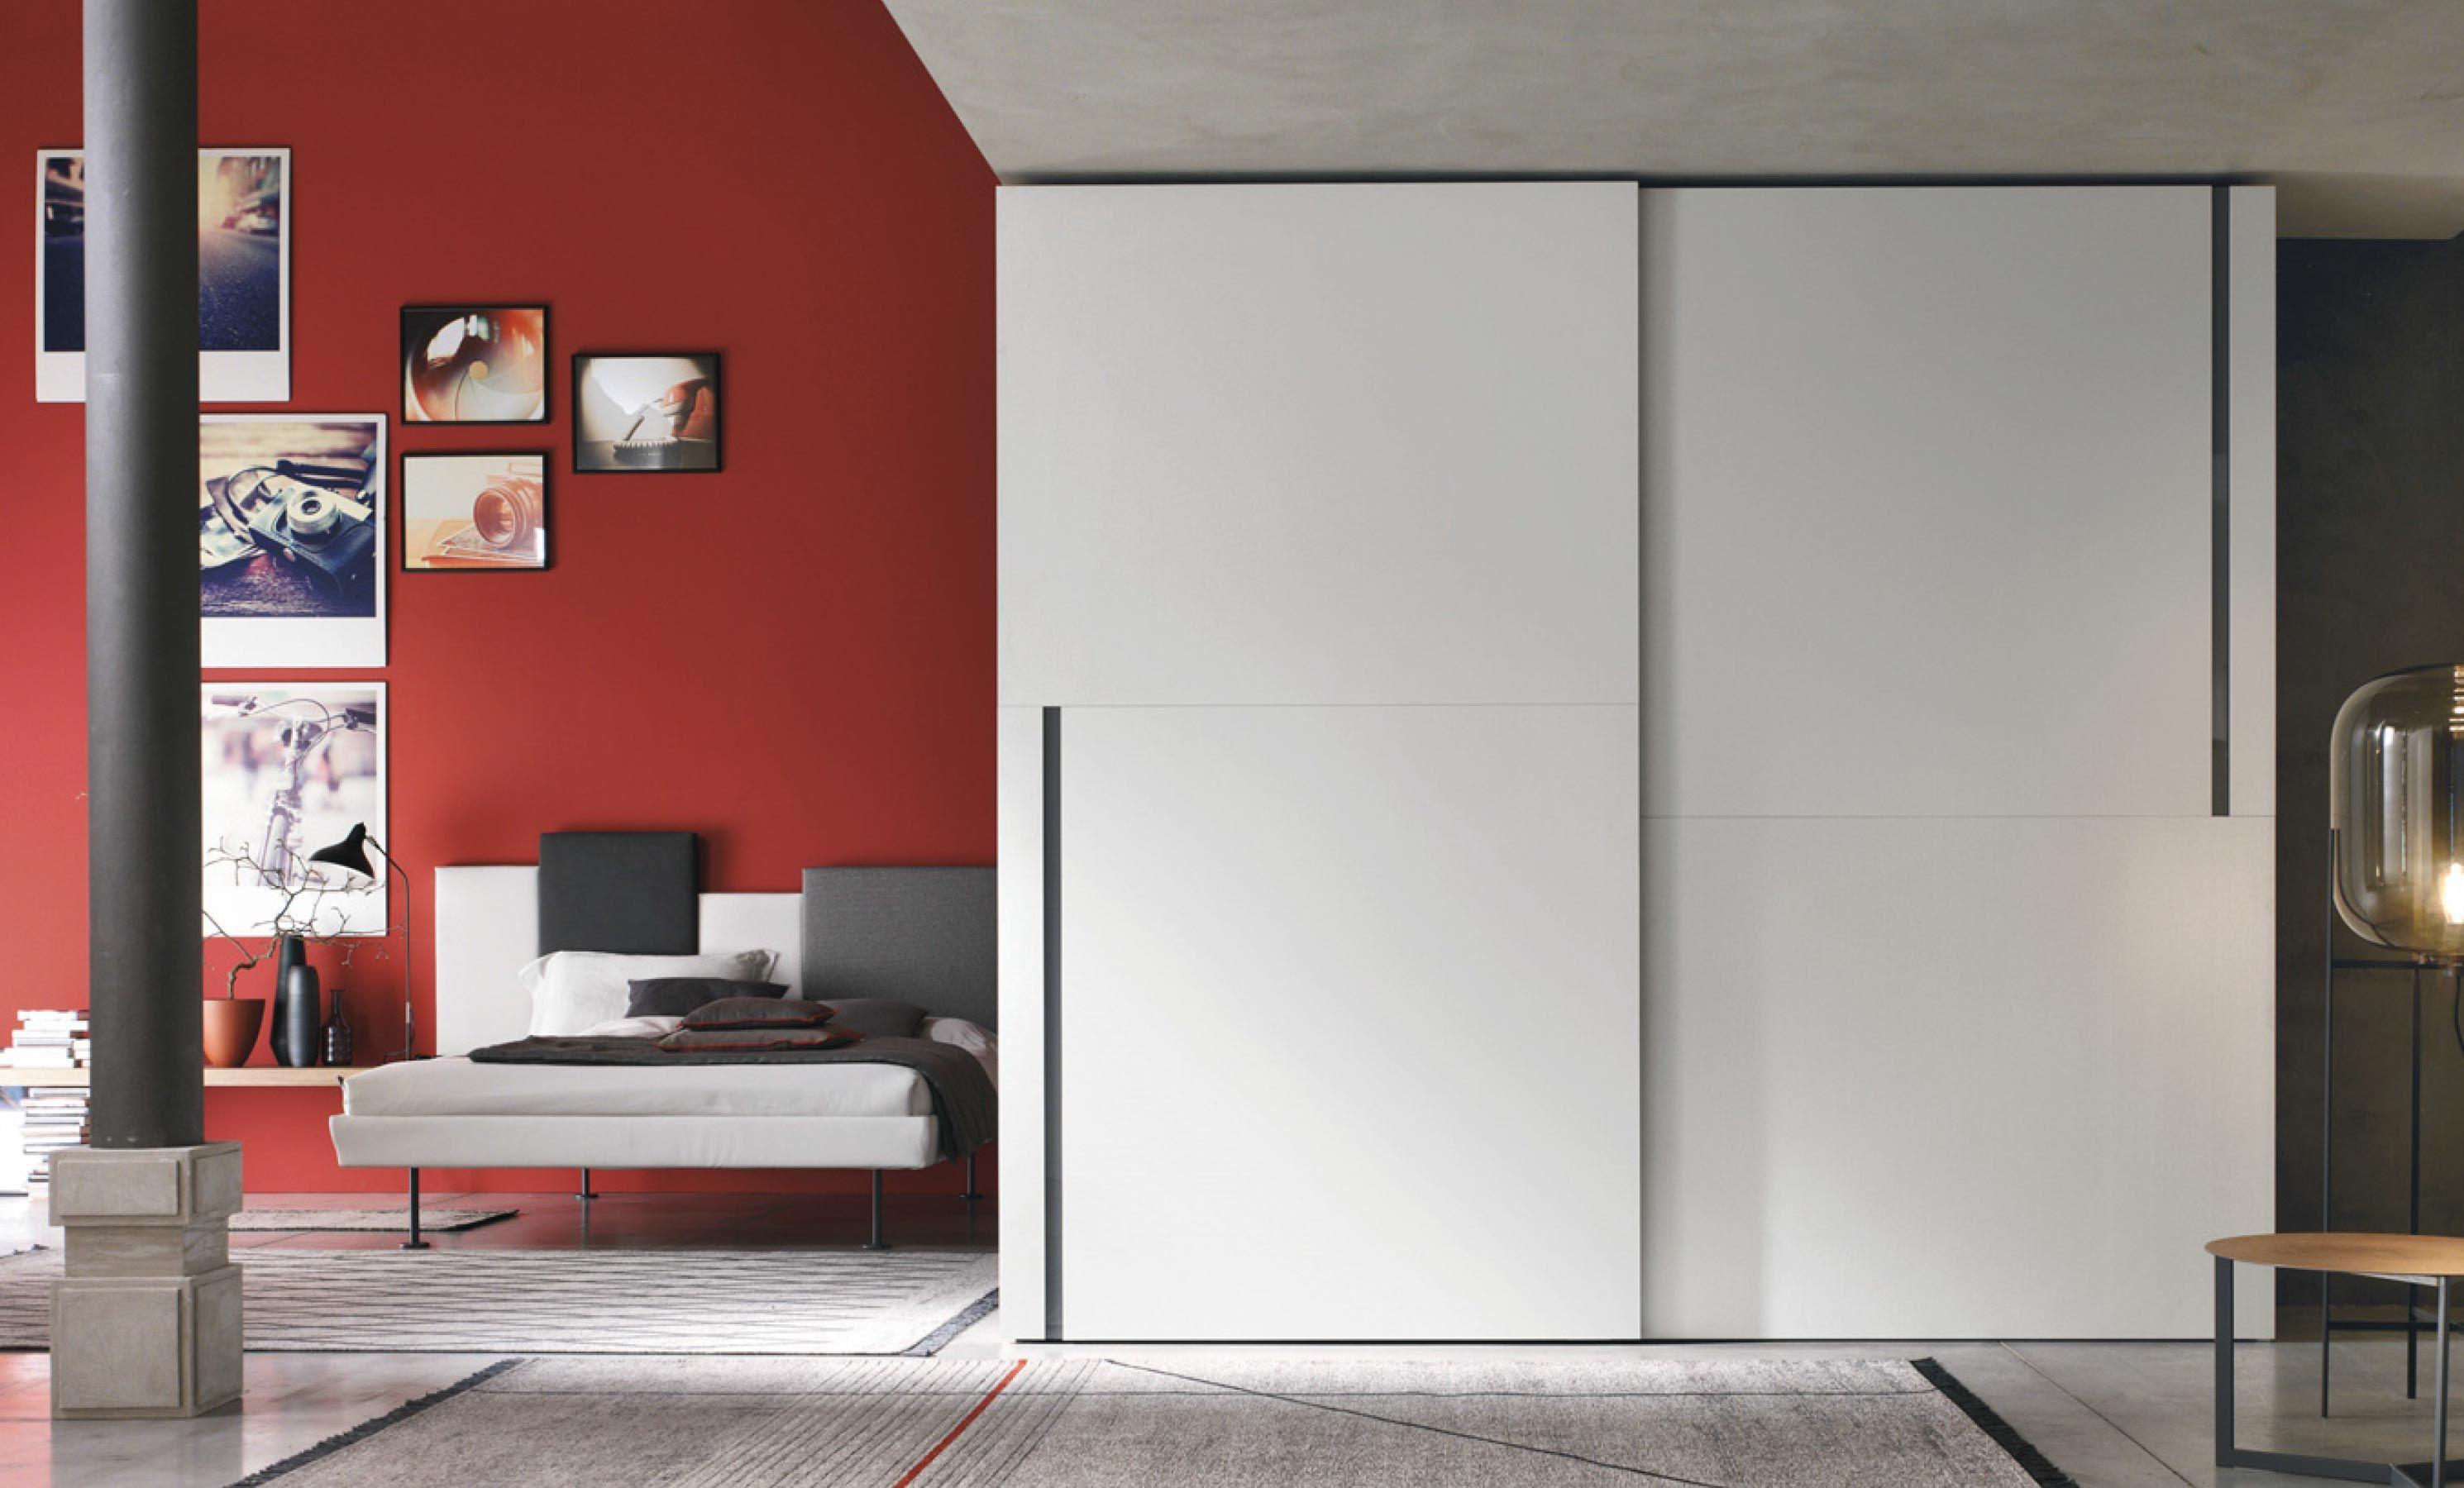 Anta Denver Scorrevole Tomasella Wardrobe Design Bedroom